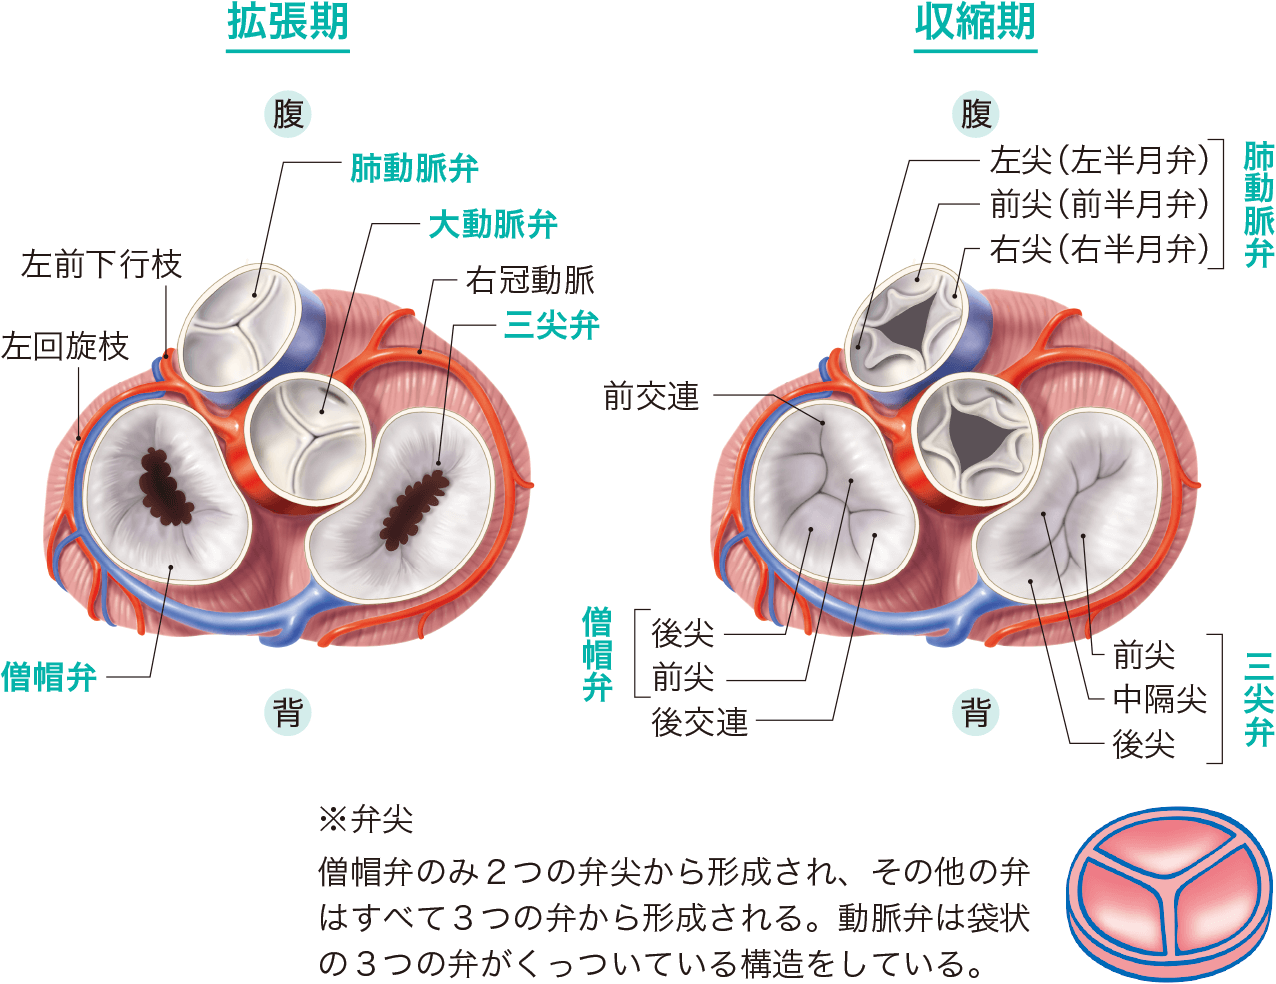 心臓弁の種類 弁尖